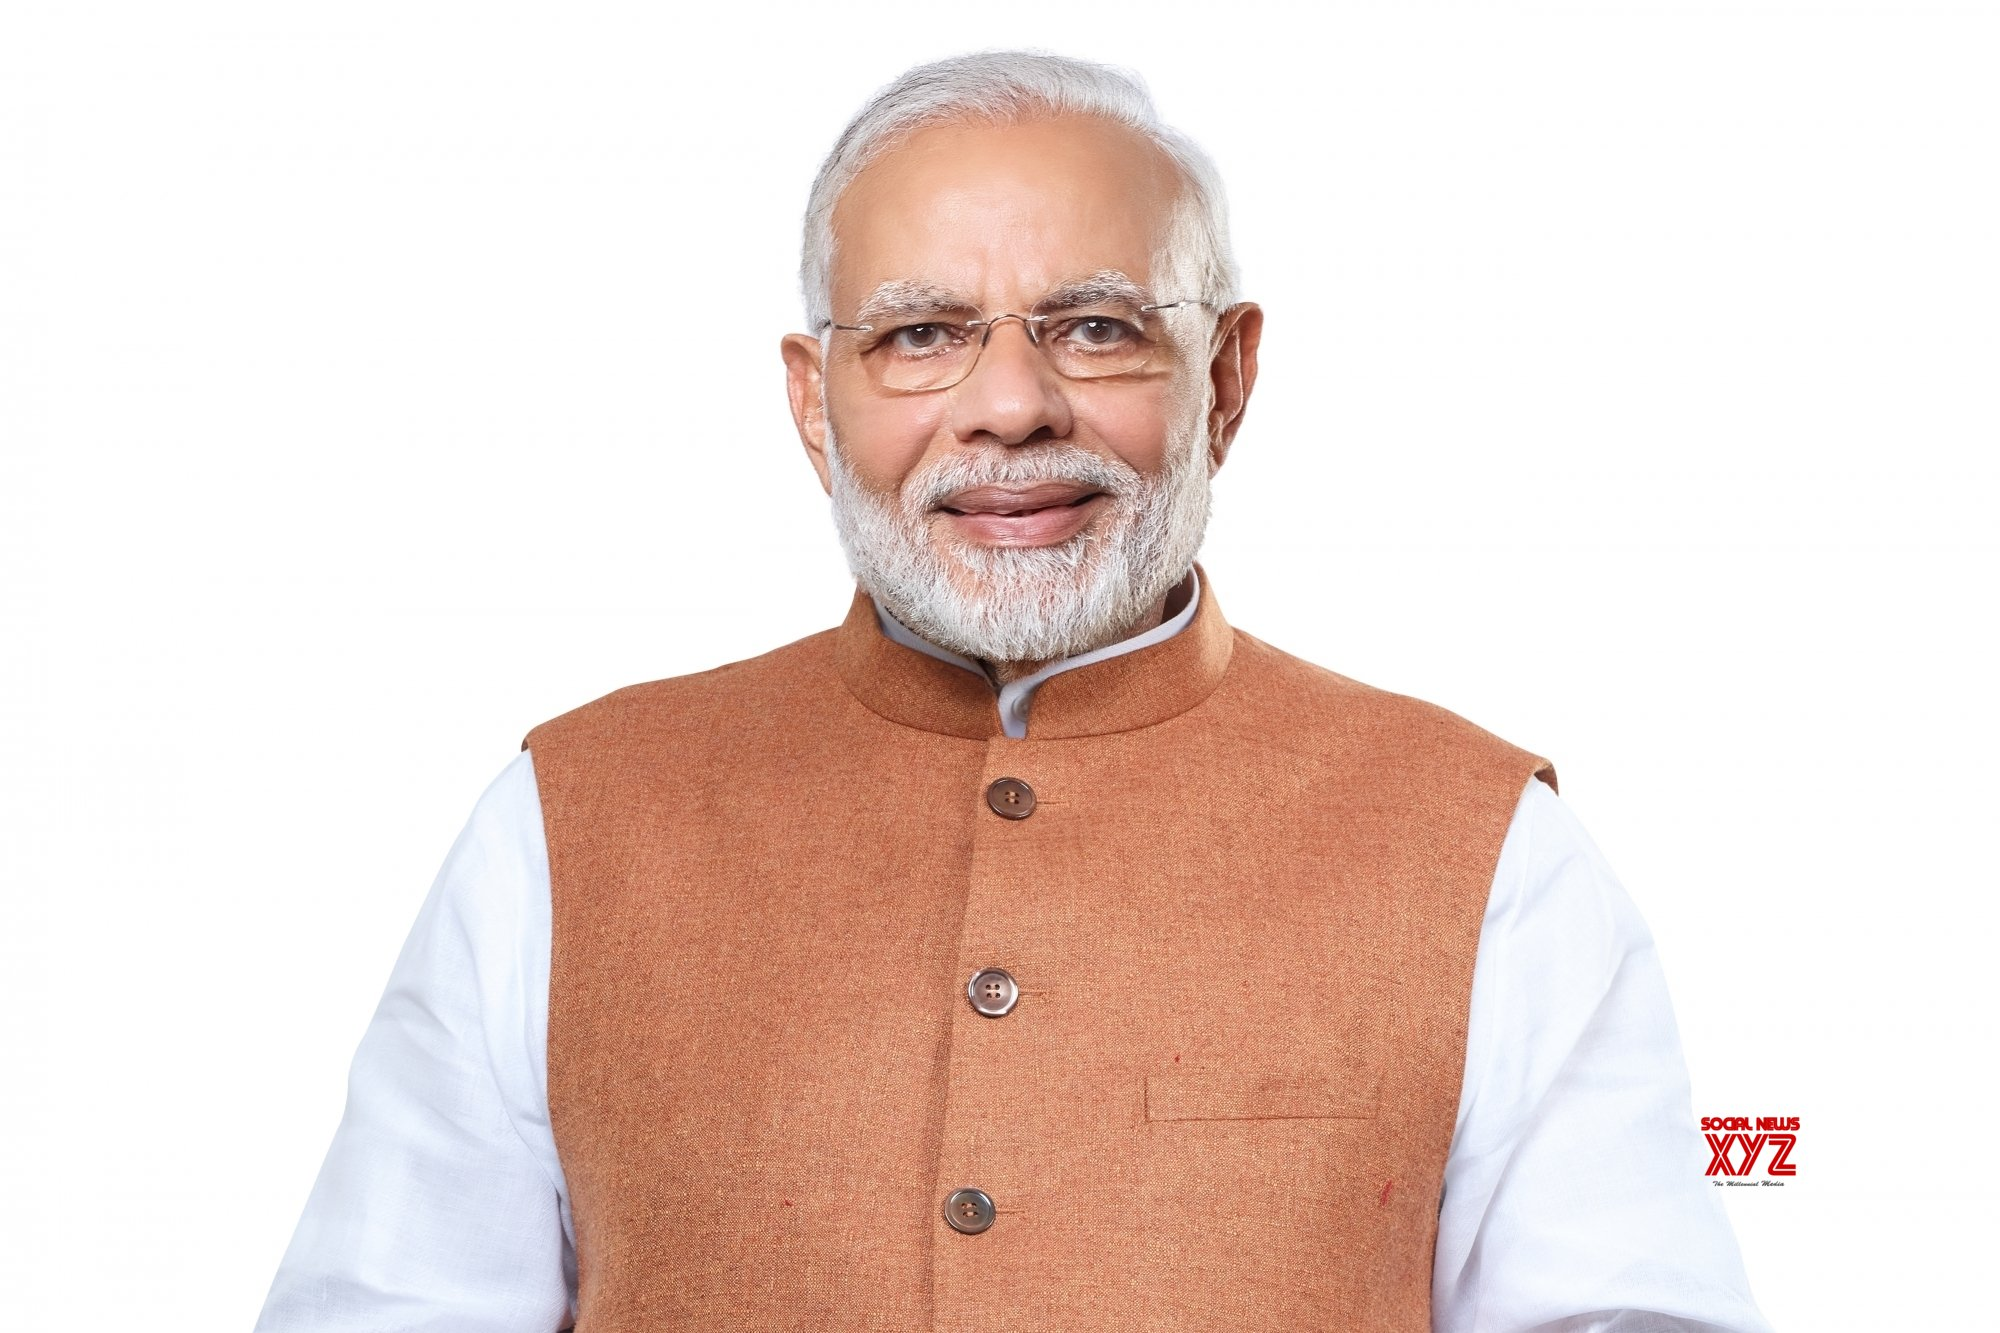 Varanasi weaver makes special mask for PM